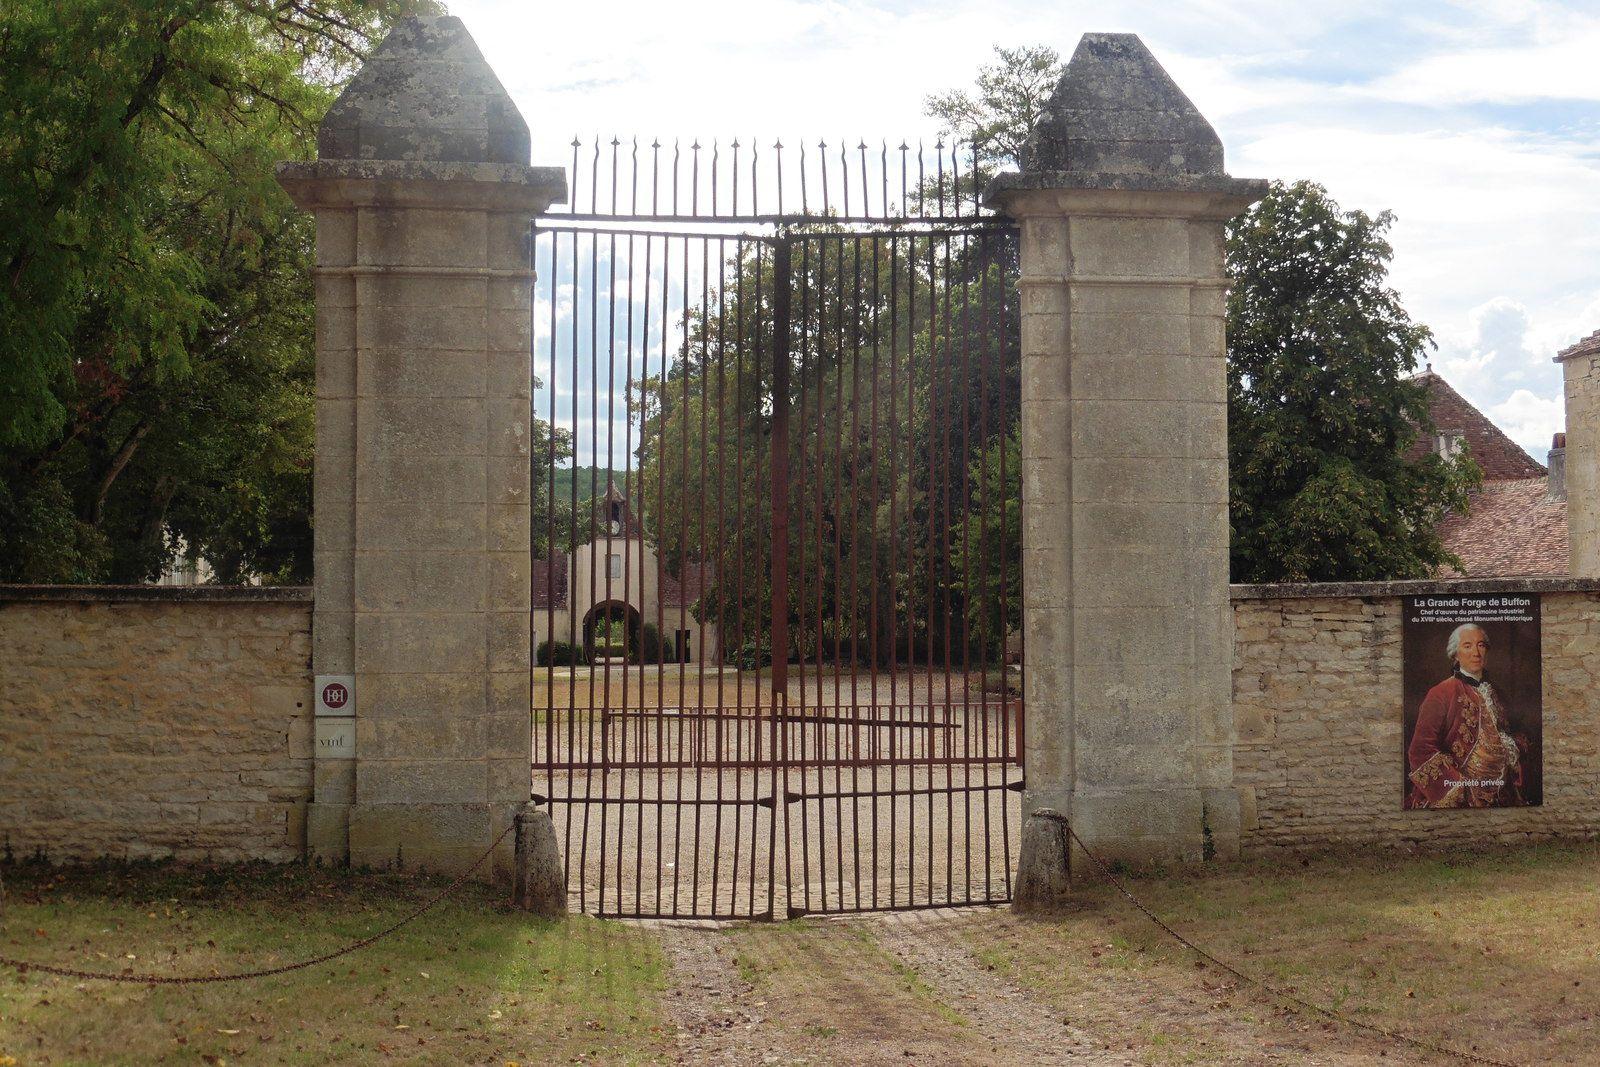 Le Tour de Bourgogne - Etape 1 - Germigny/Buffon - 82,8 km